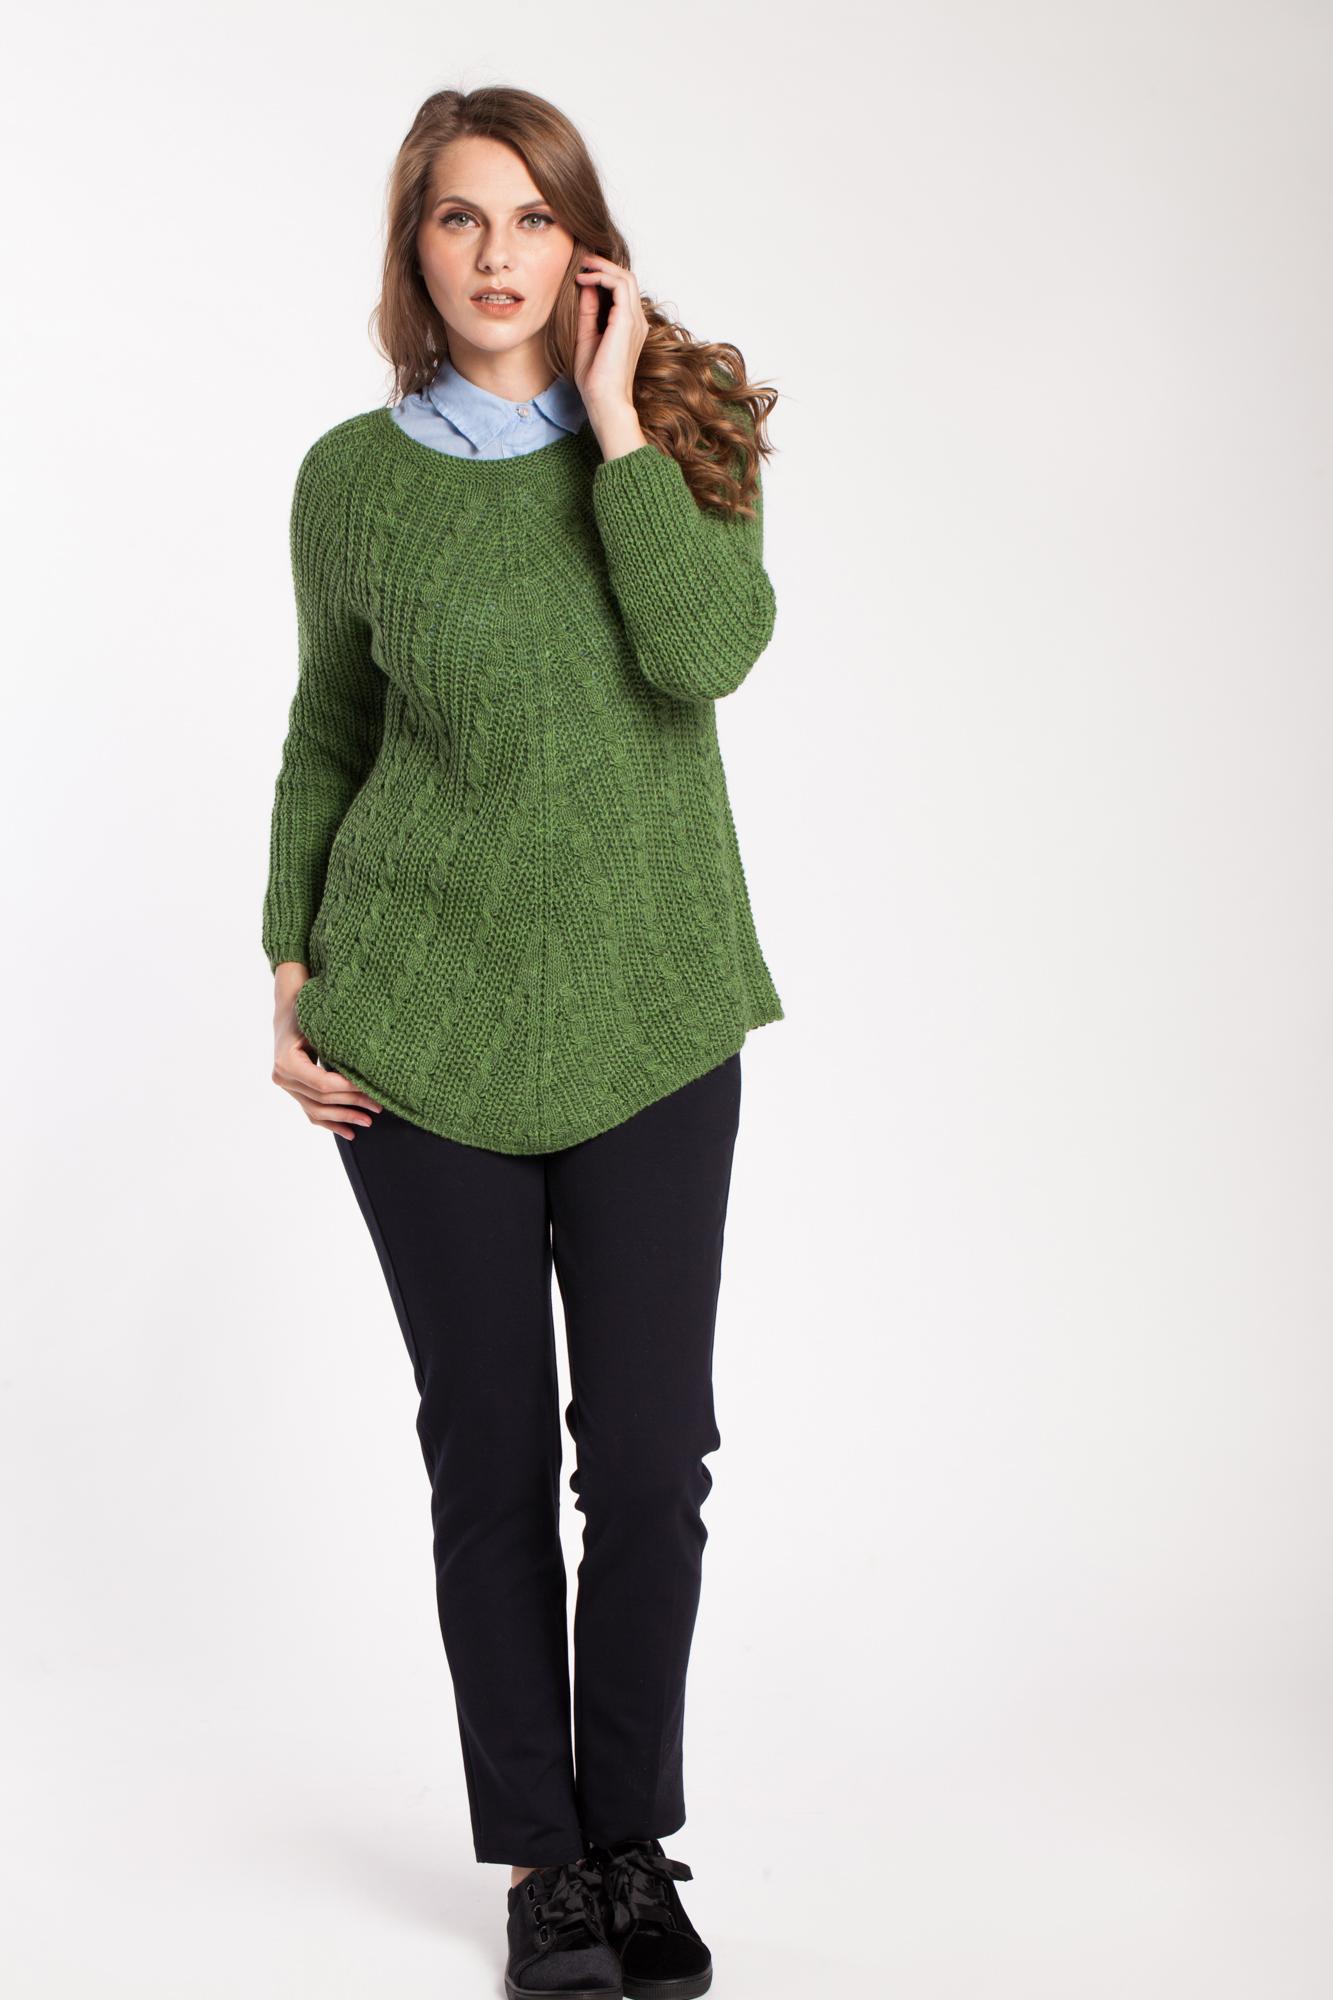 Pulover verde asimetric Sara